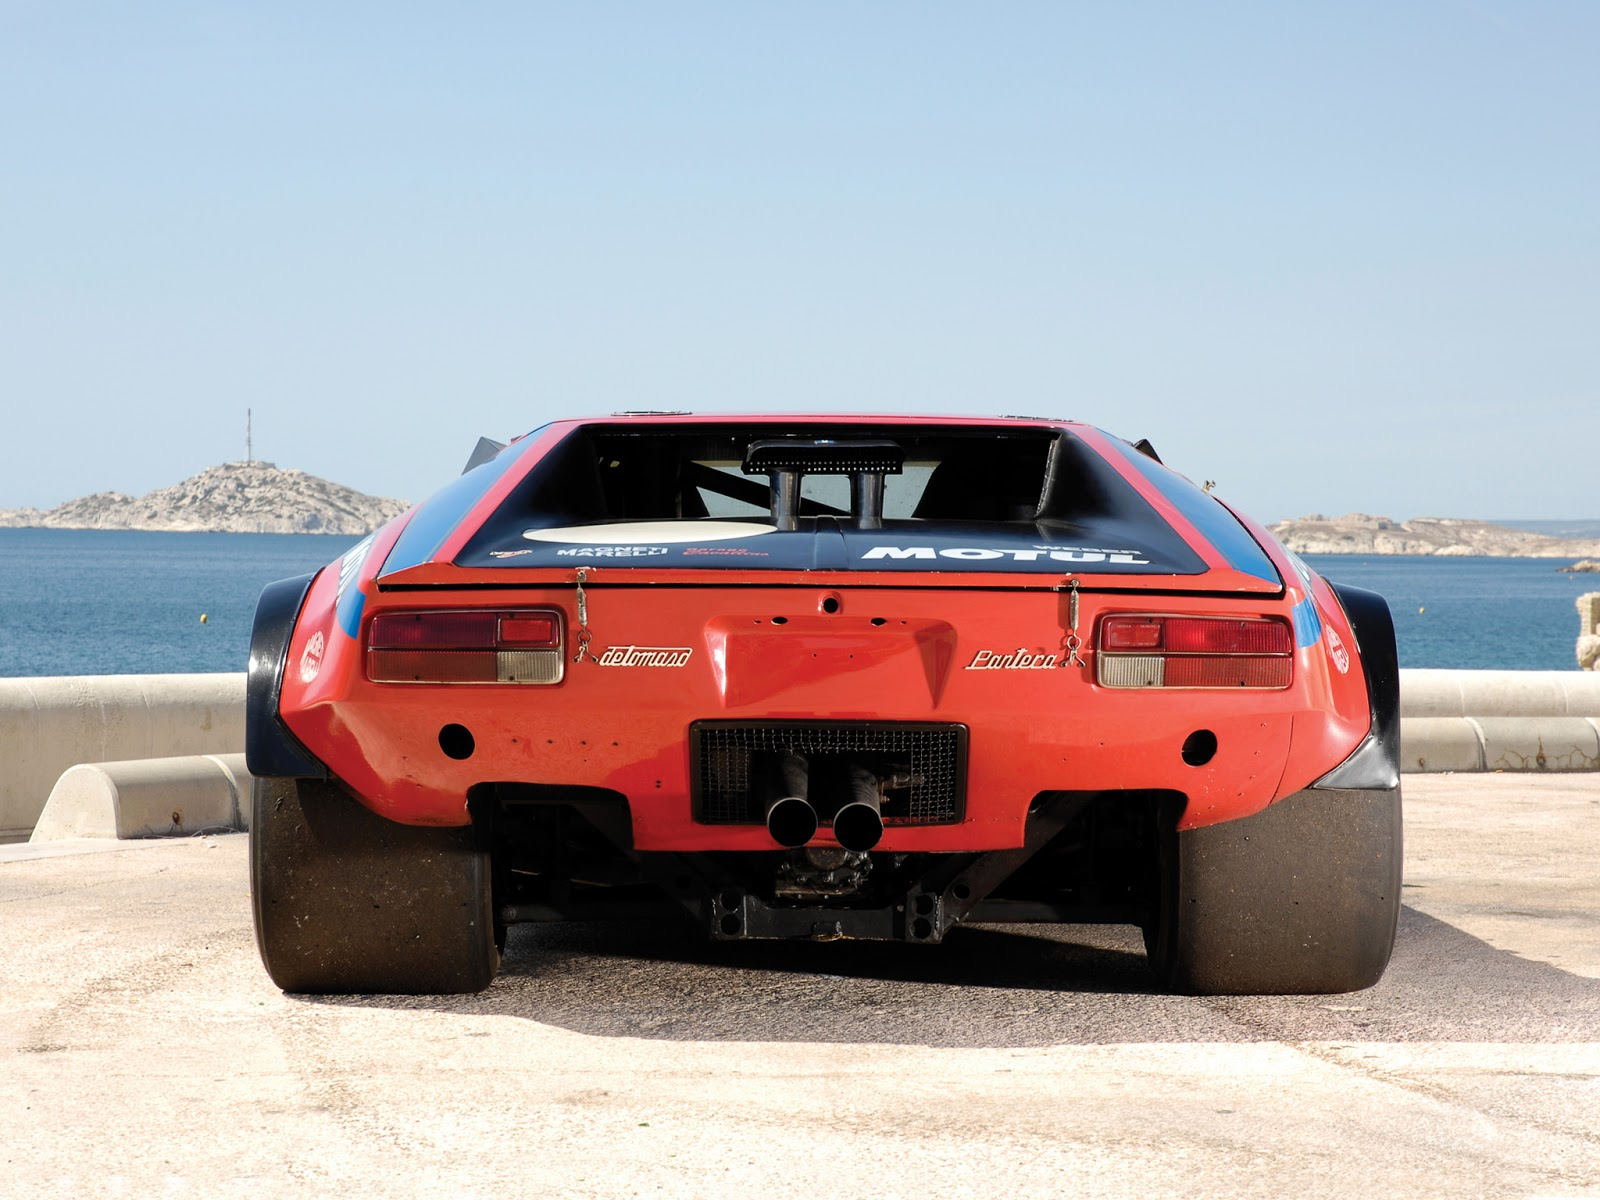 Net Cars Show De Tomaso Pantera 1971 91